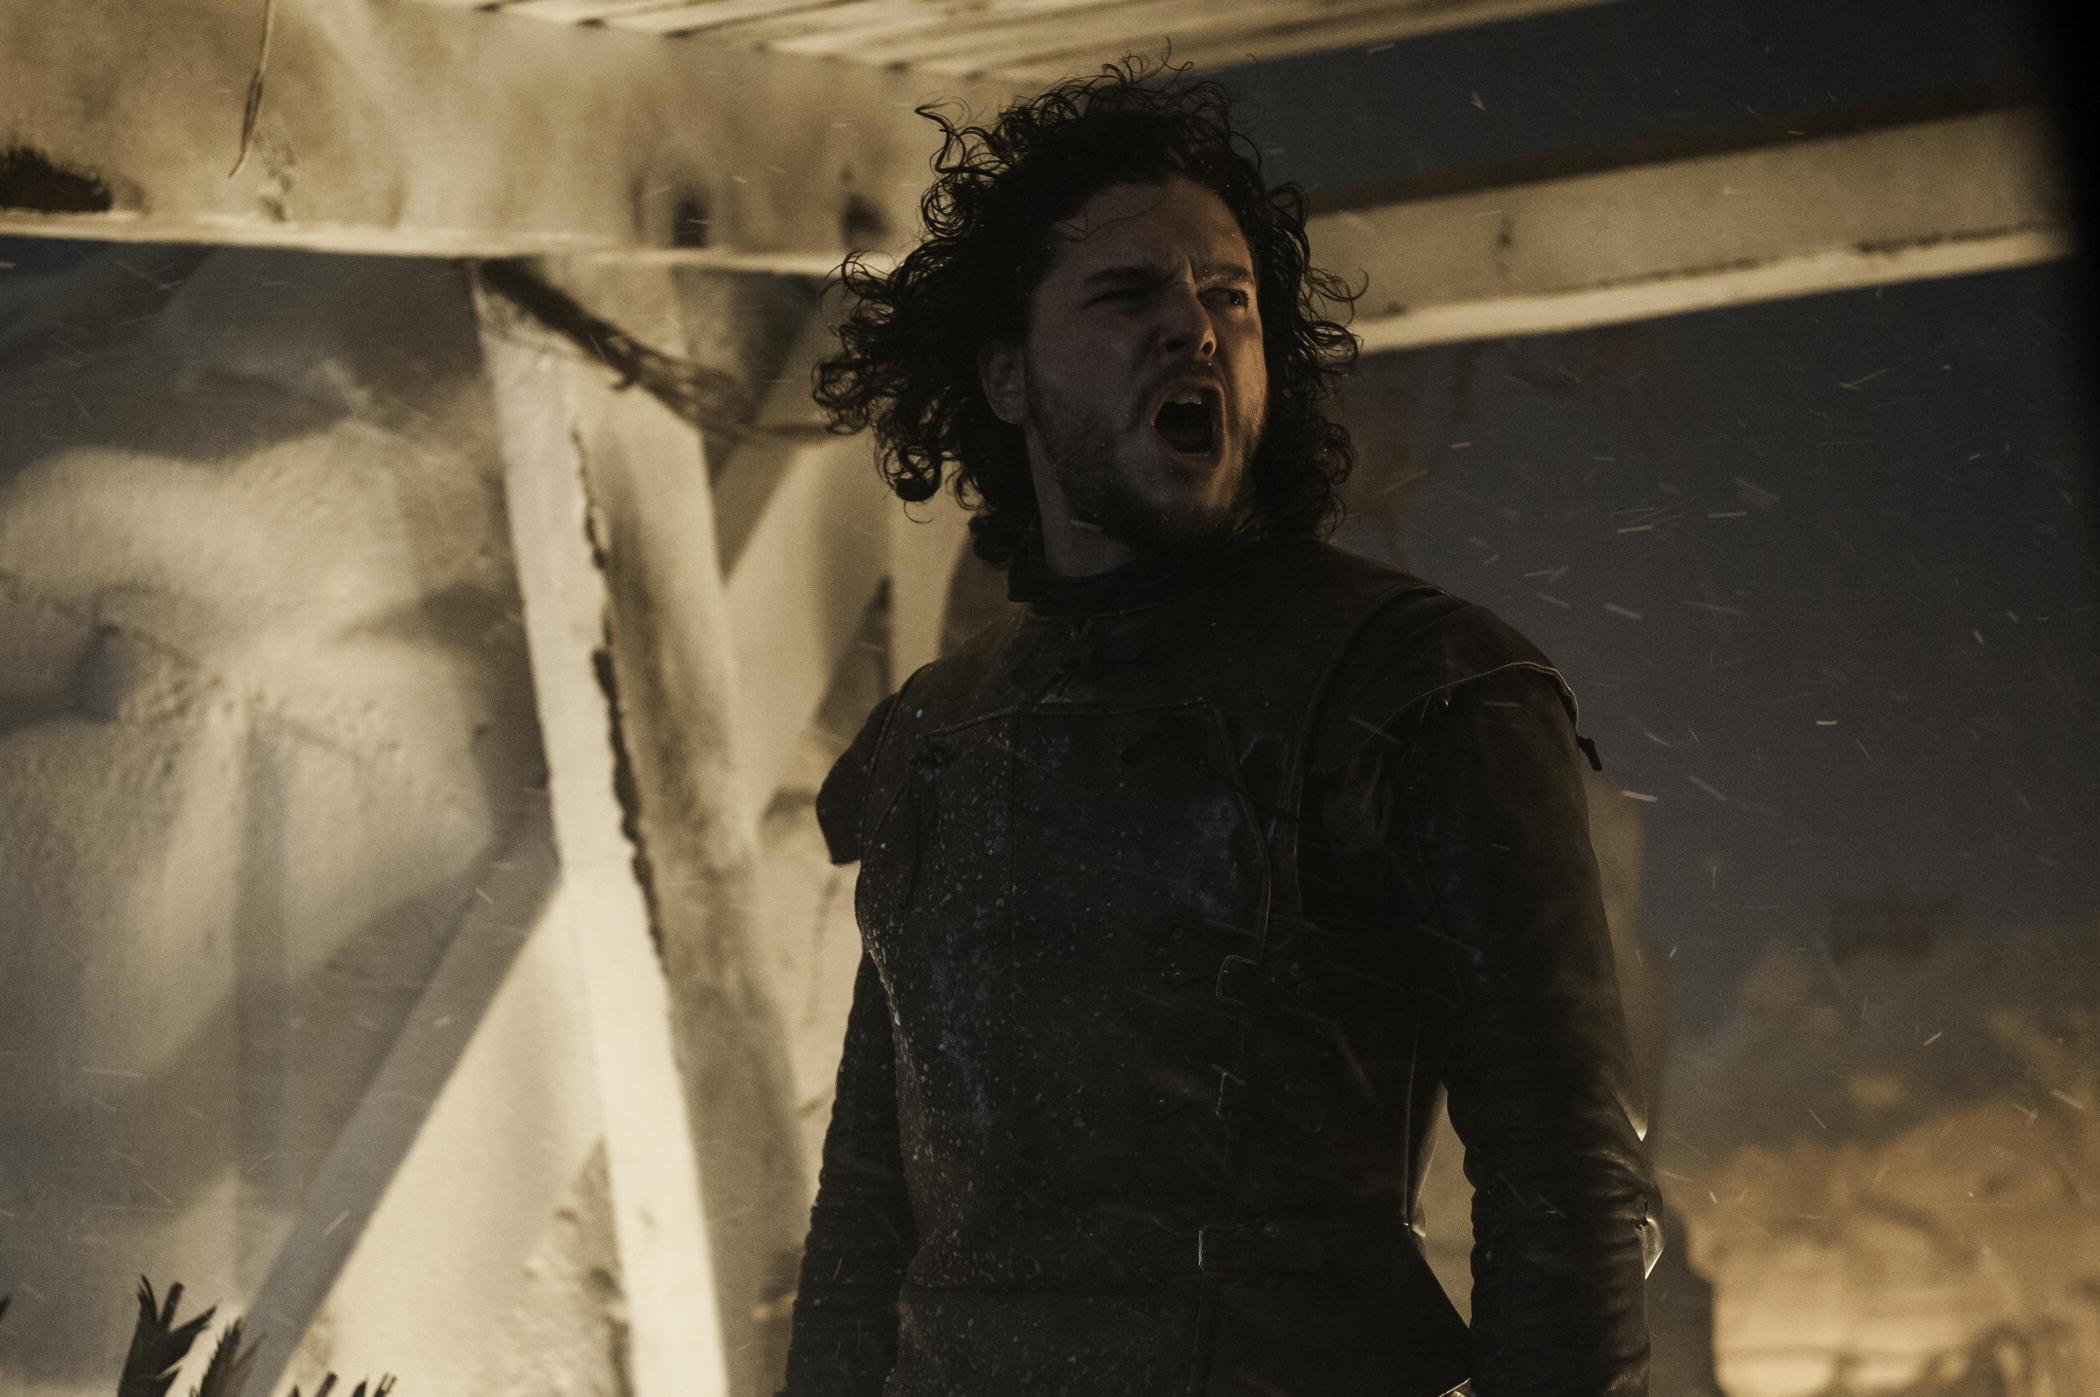 Kit Harington on 'Game of Thrones'